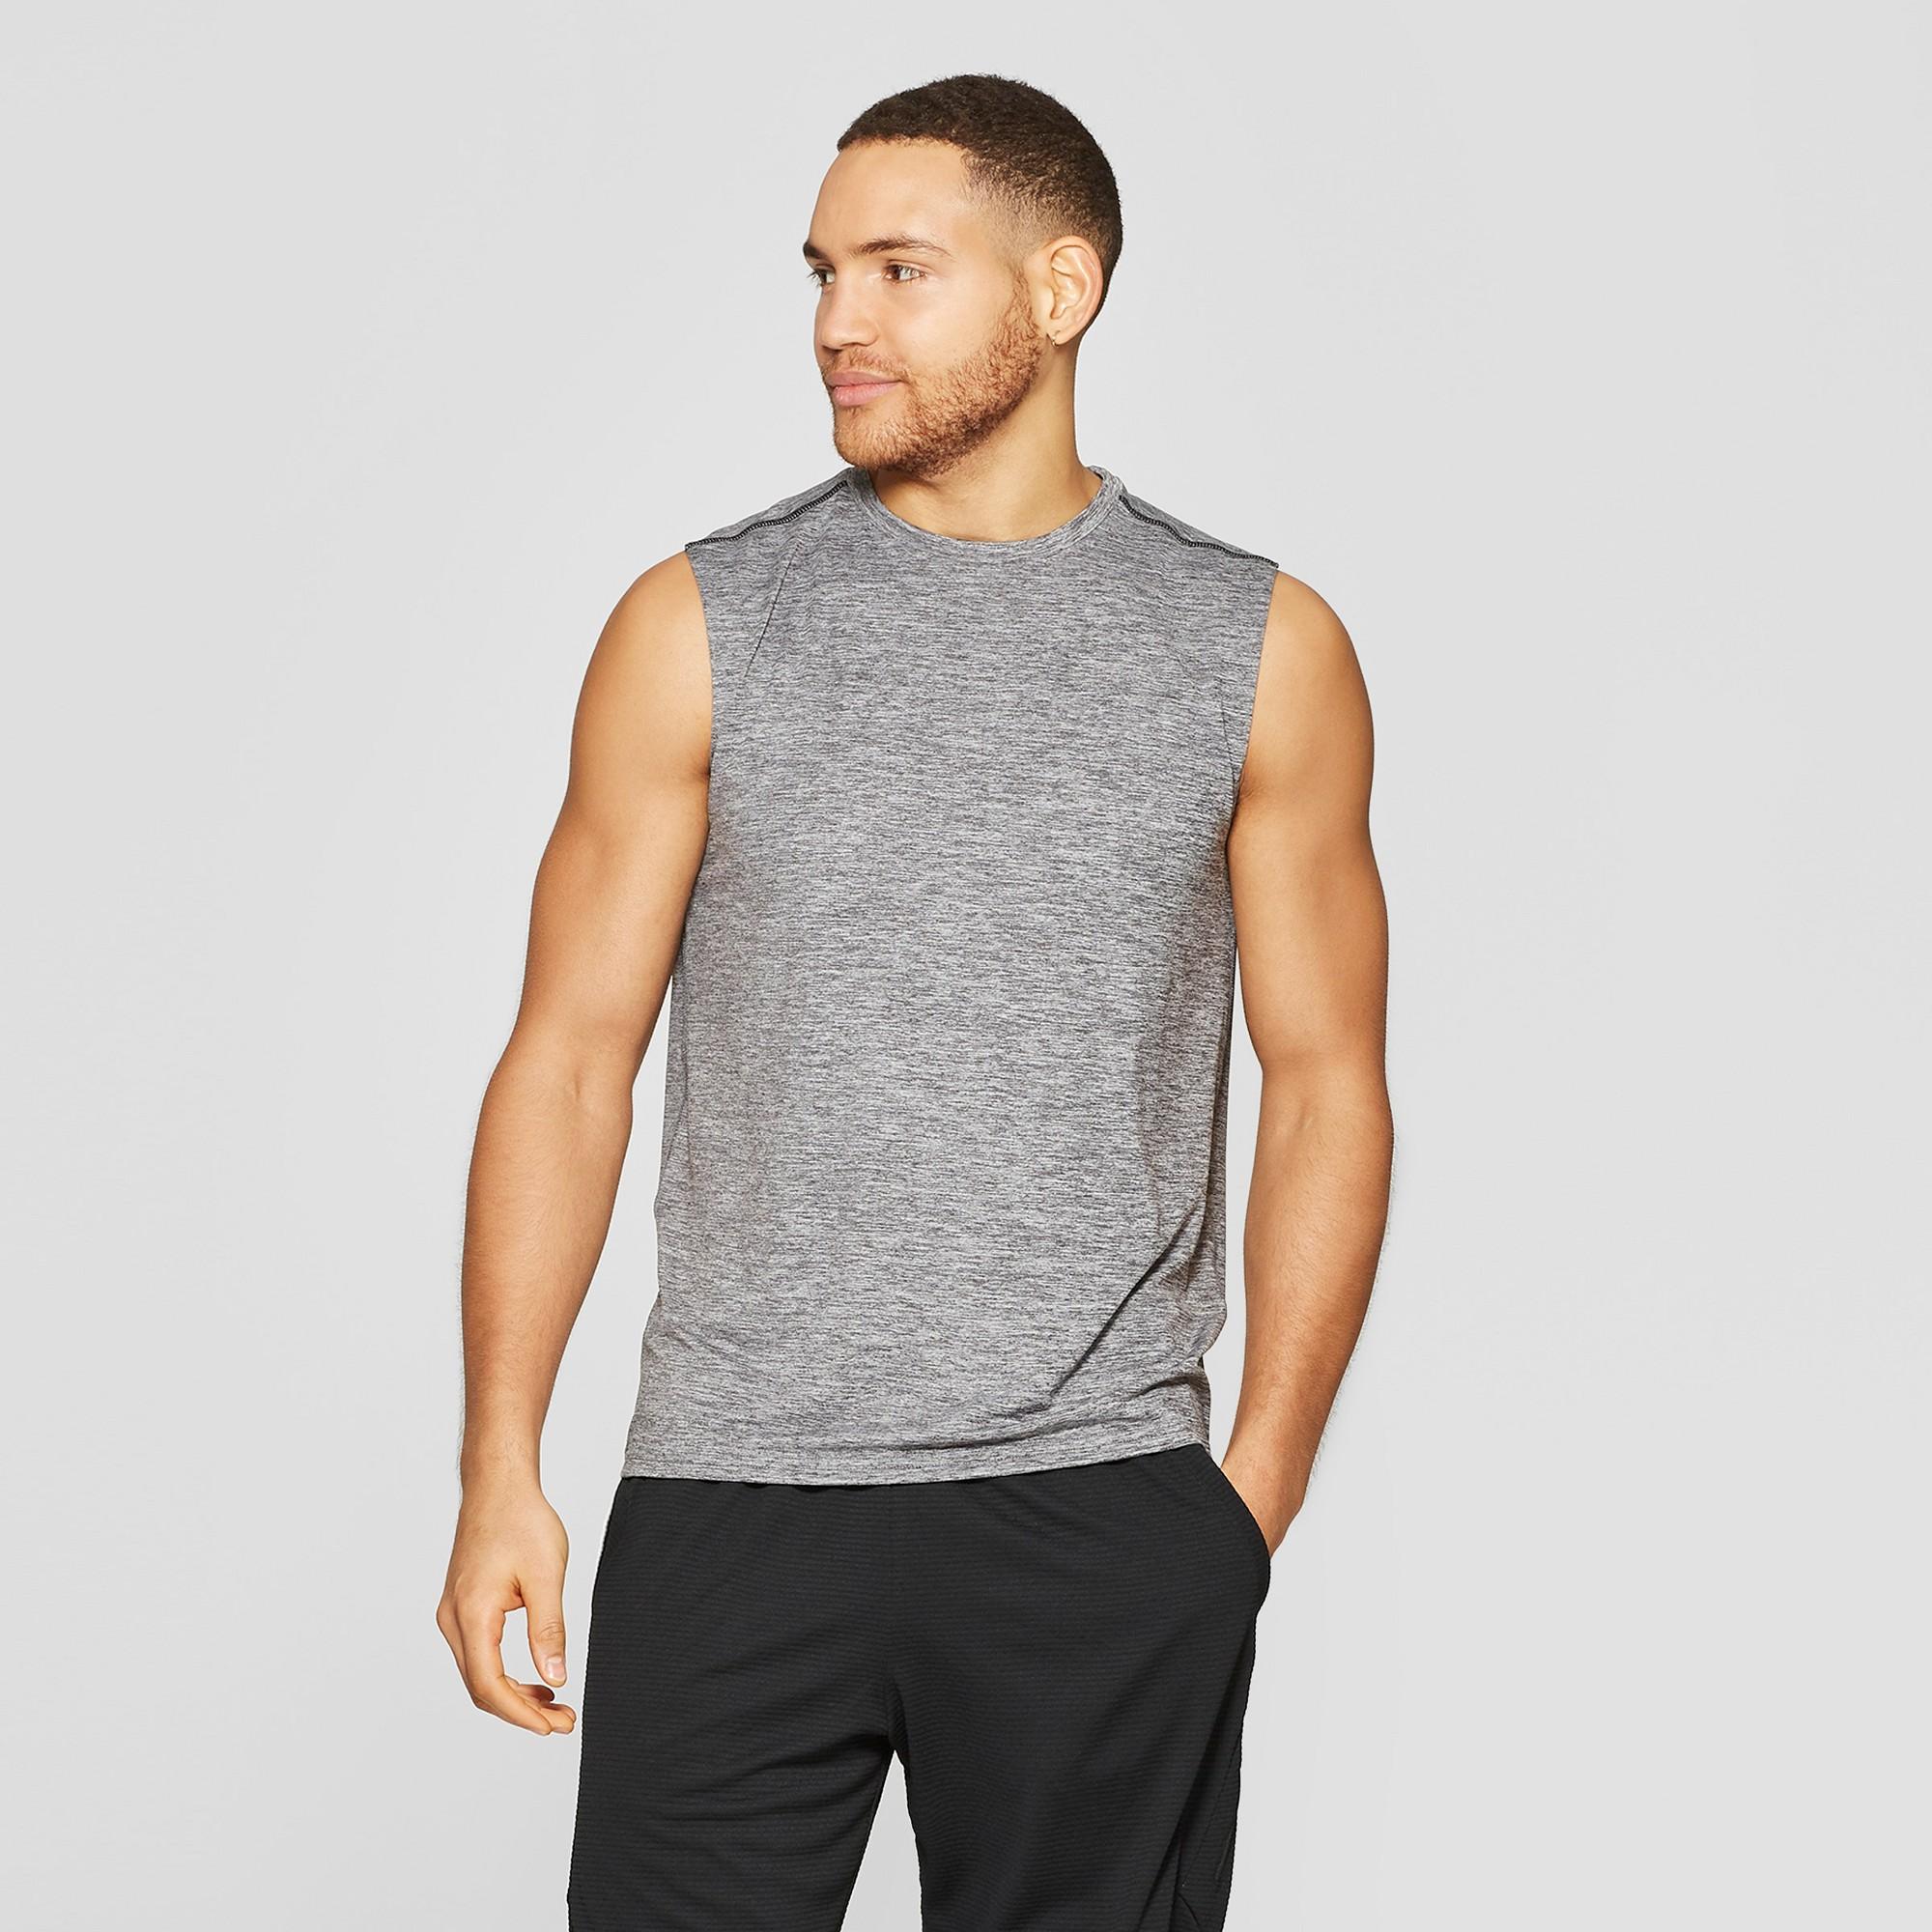 Men's Sleeveless Tech T-Shirt - C9 Champion Black Heather M, Size: Medium, Black Grey